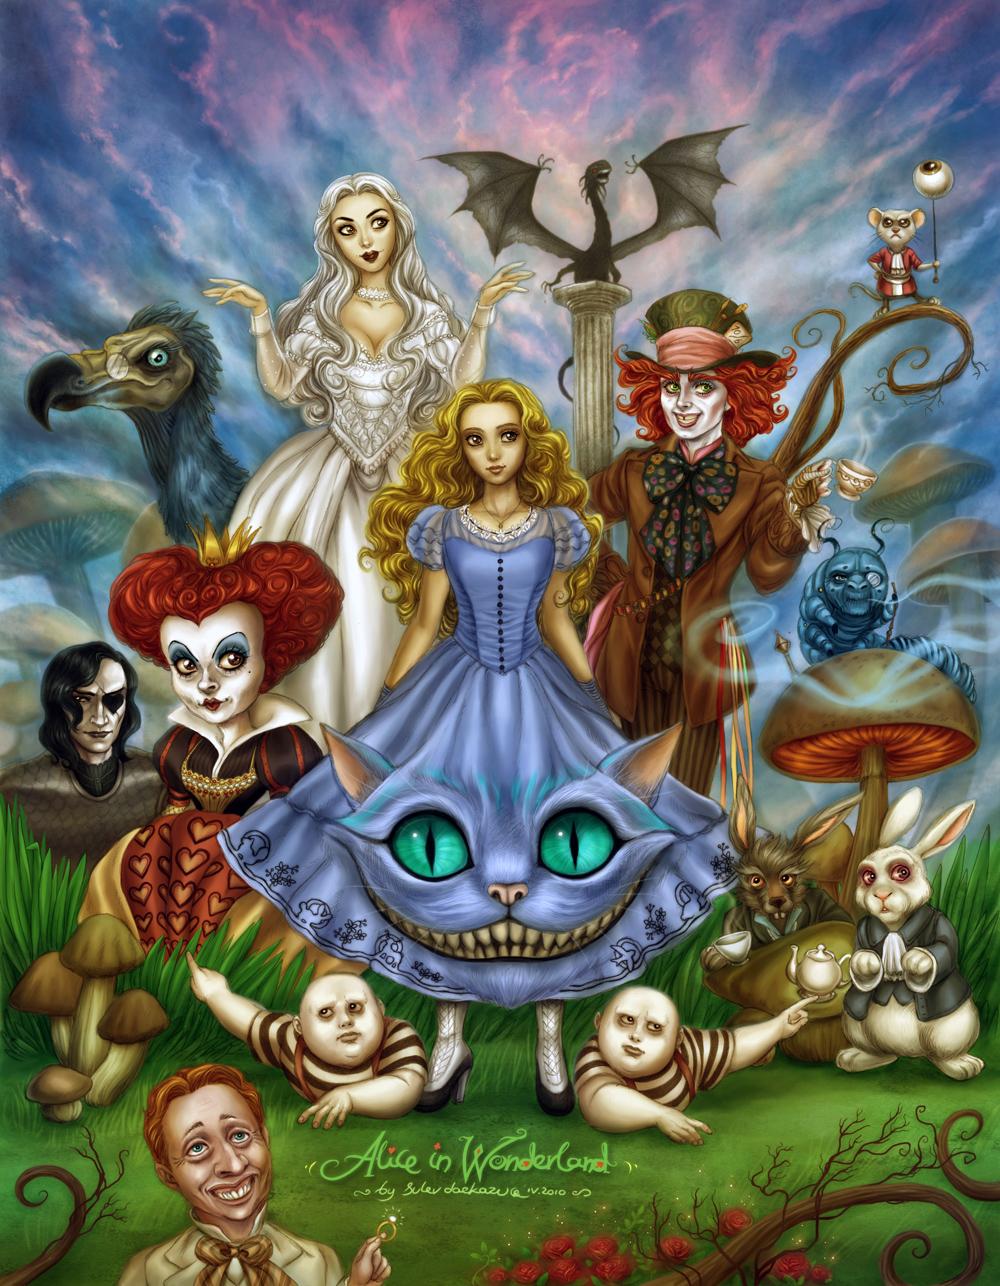 Alice in wonderland live action-6107